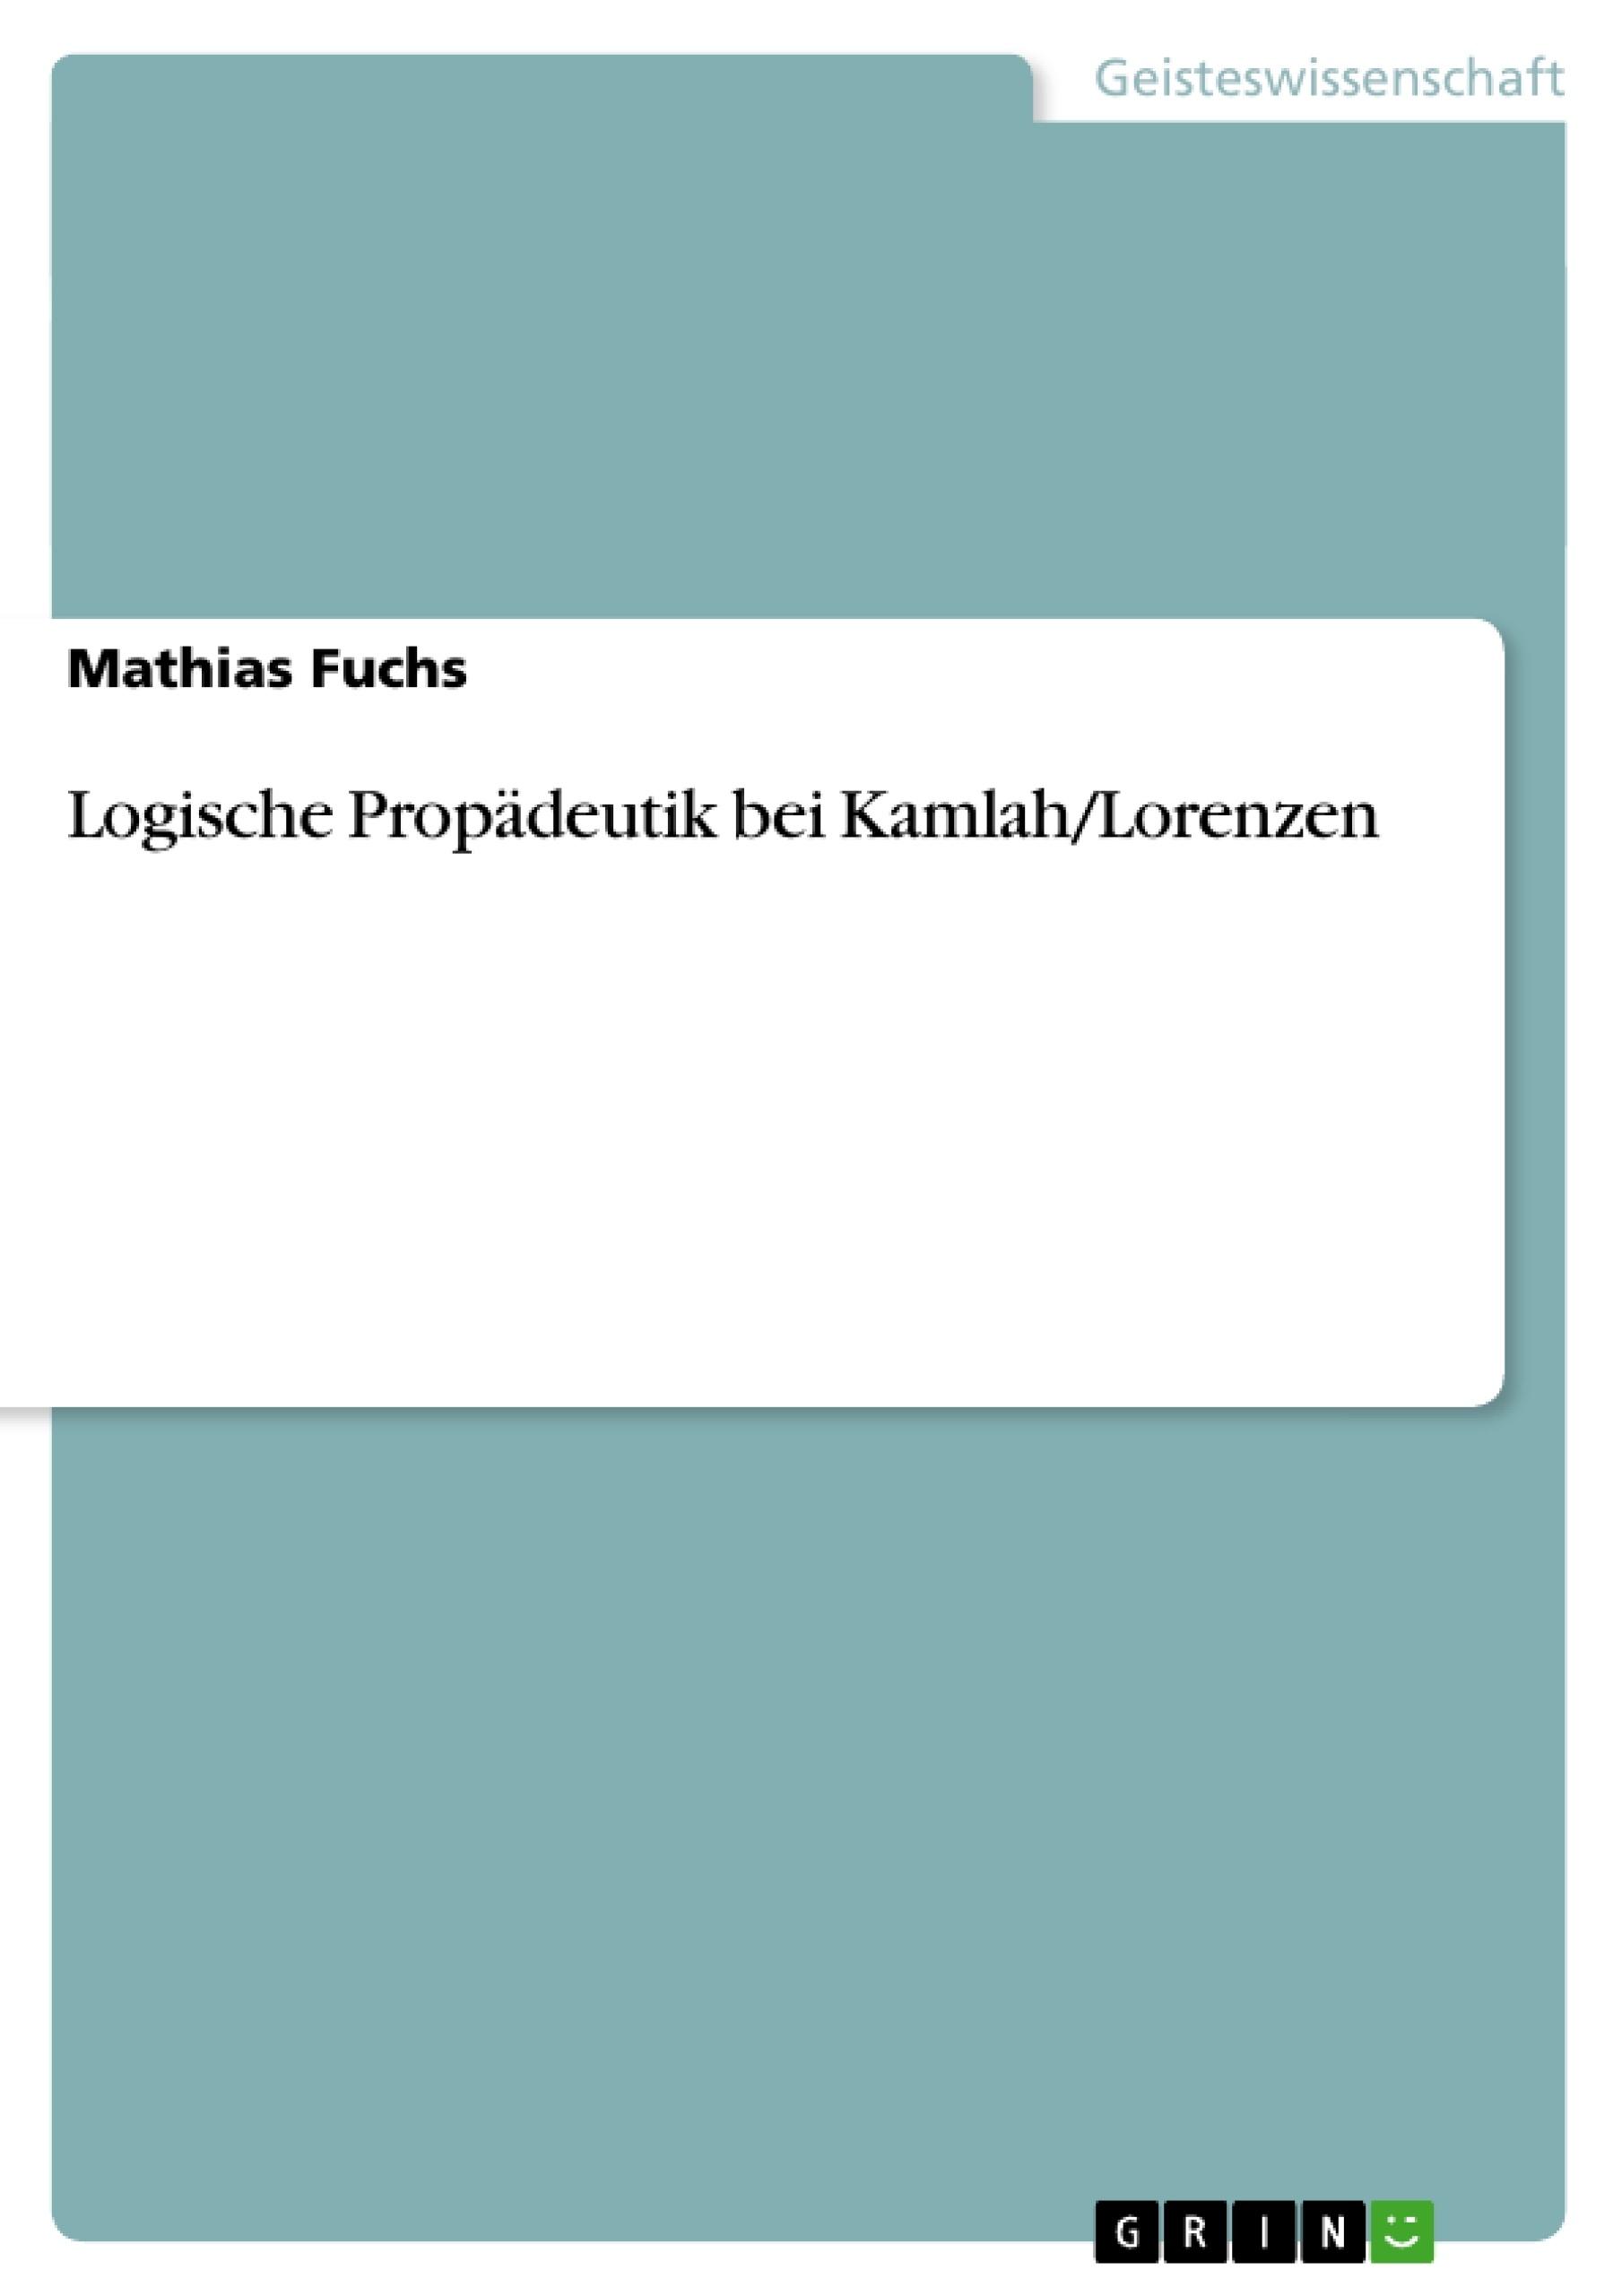 Titel: Logische Propädeutik bei Kamlah/Lorenzen